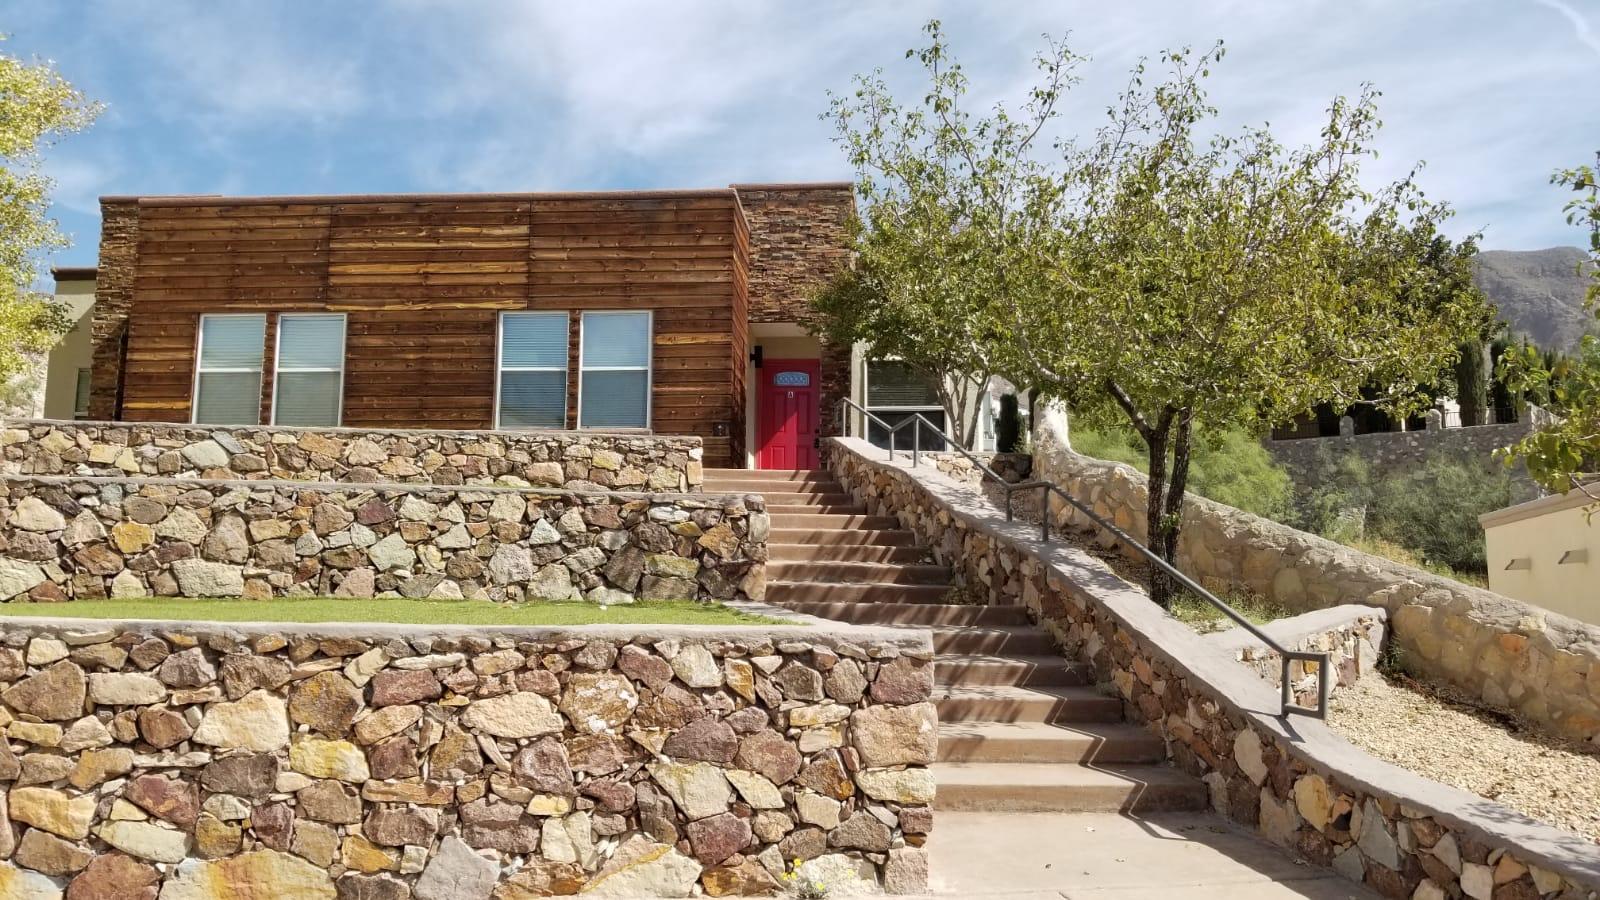 4717 Pistolero Lane, El Paso, Texas 79912, 3 Bedrooms Bedrooms, ,2 BathroomsBathrooms,Residential Rental,For Rent,Pistolero,835980